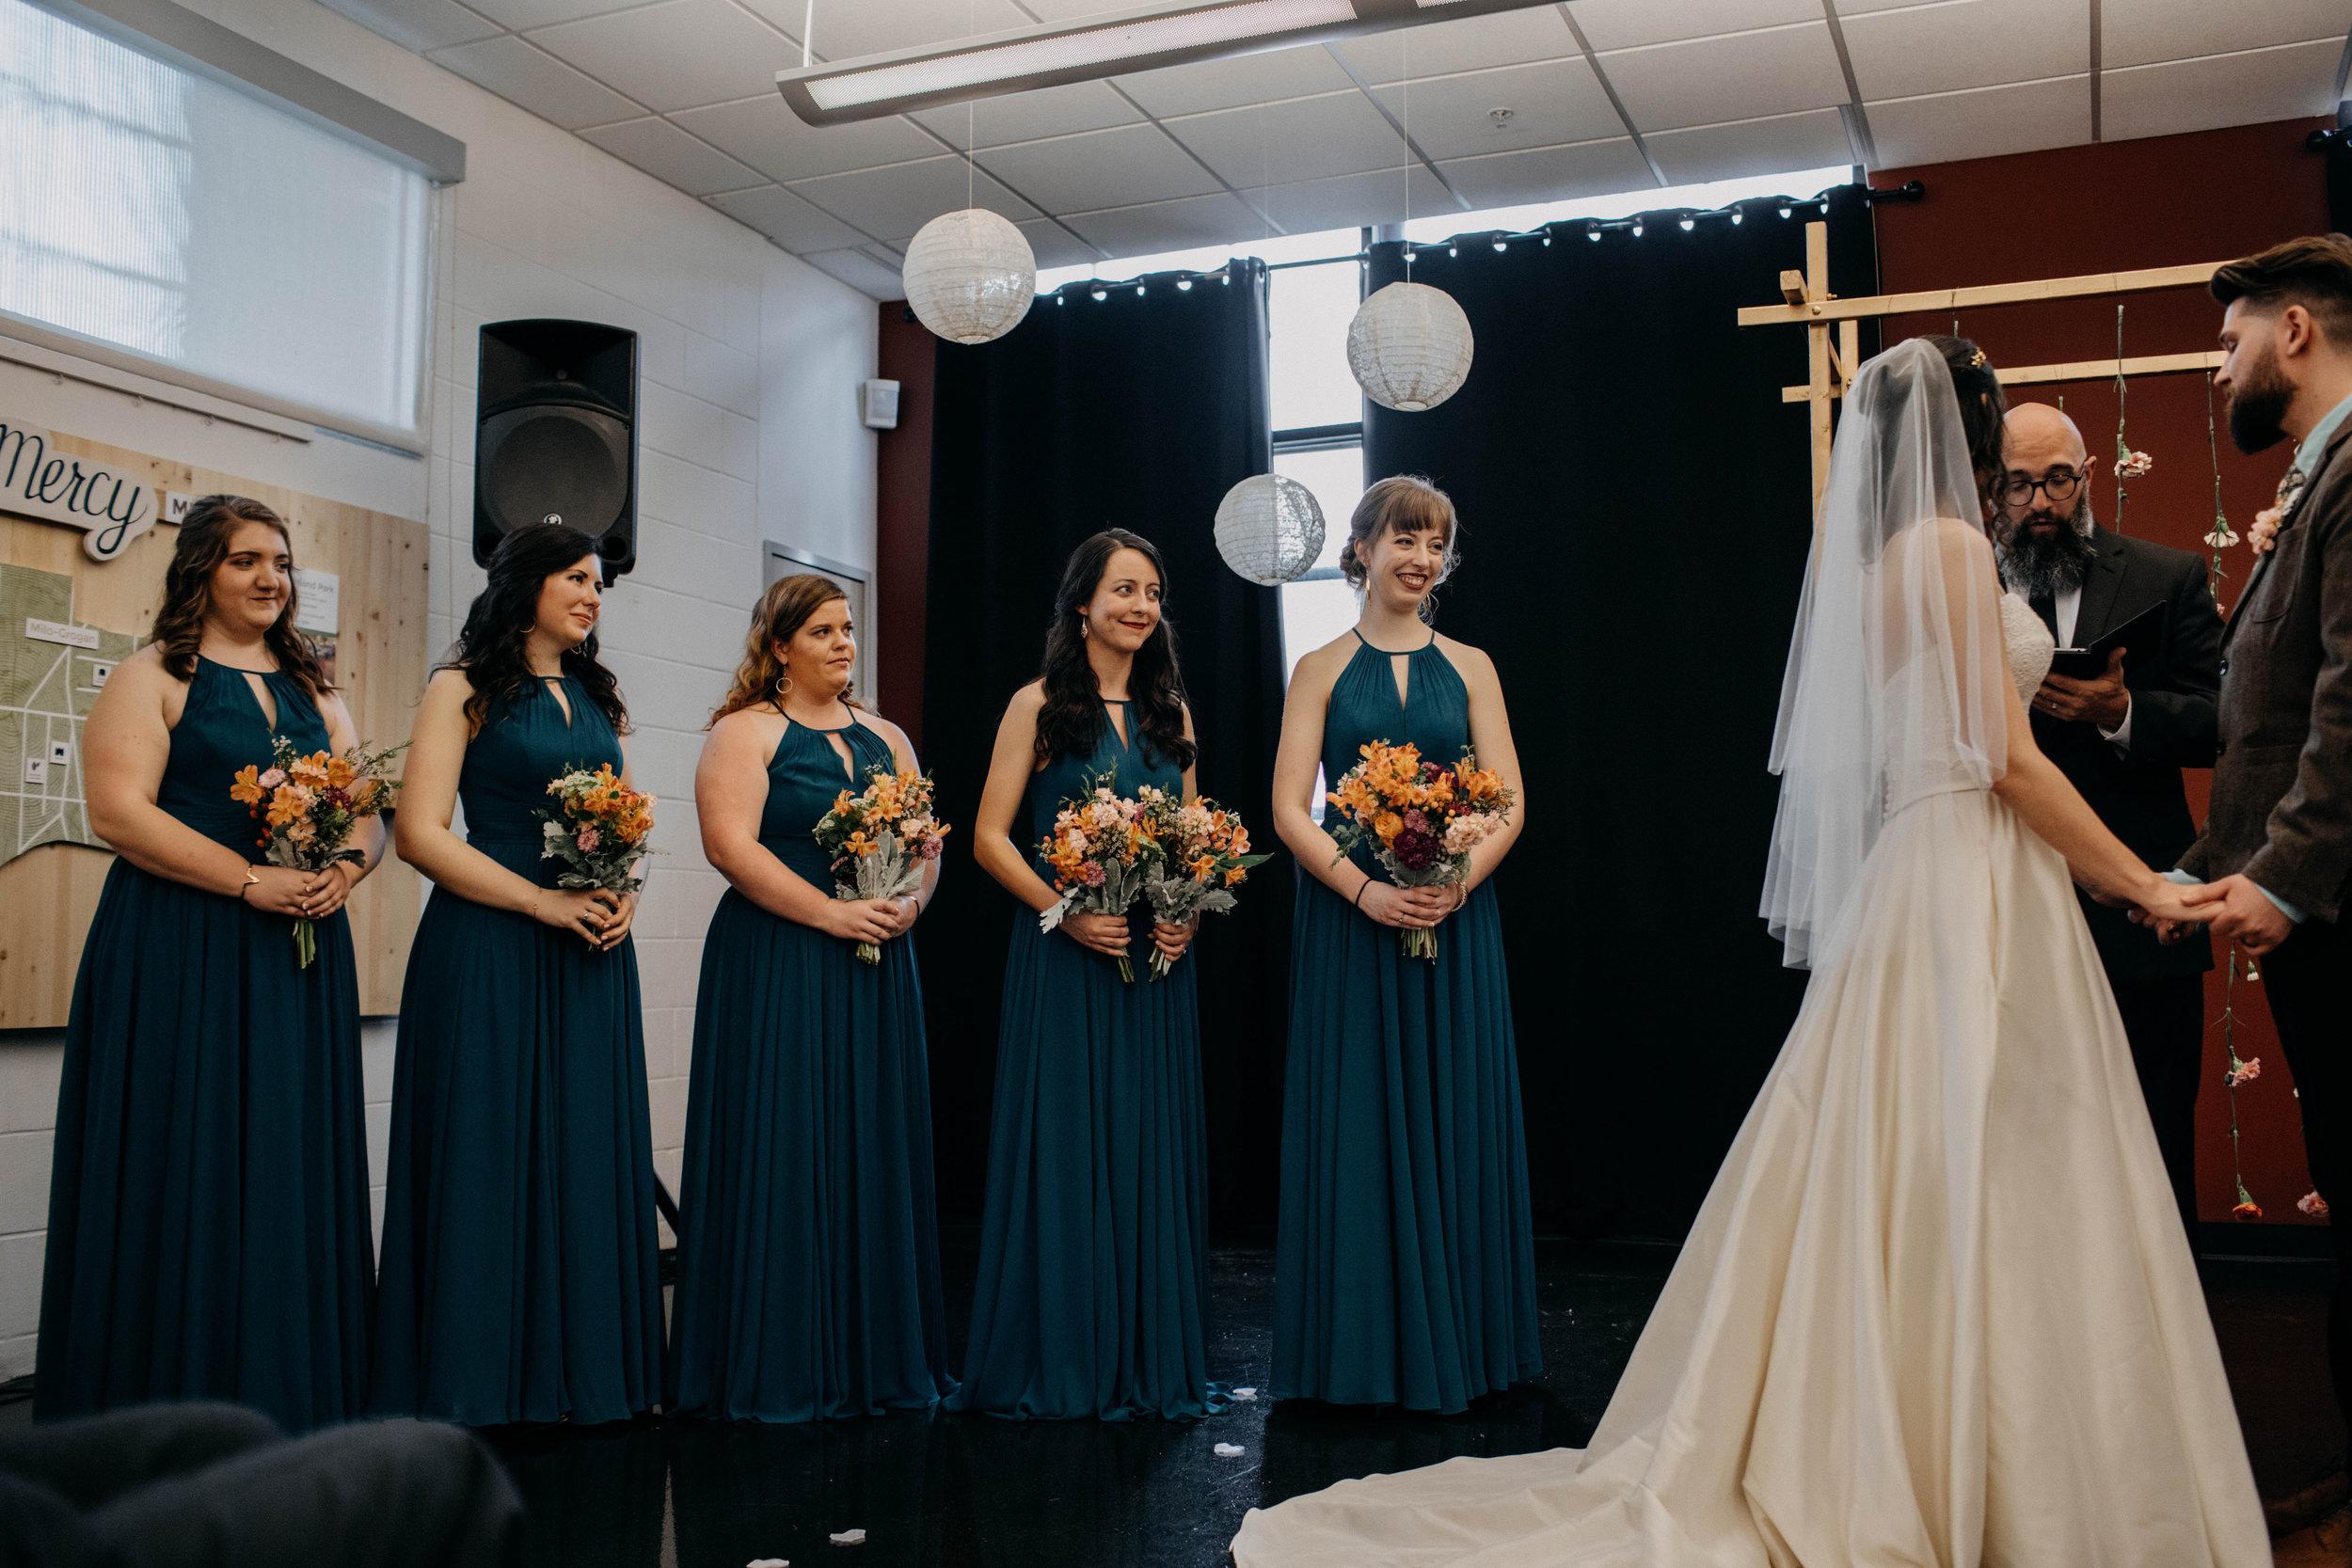 Columbus, Ohio Wedding Photographer Everal Barn At Heritage Park Wedding Venue Grace E Jones Photography52.jpg